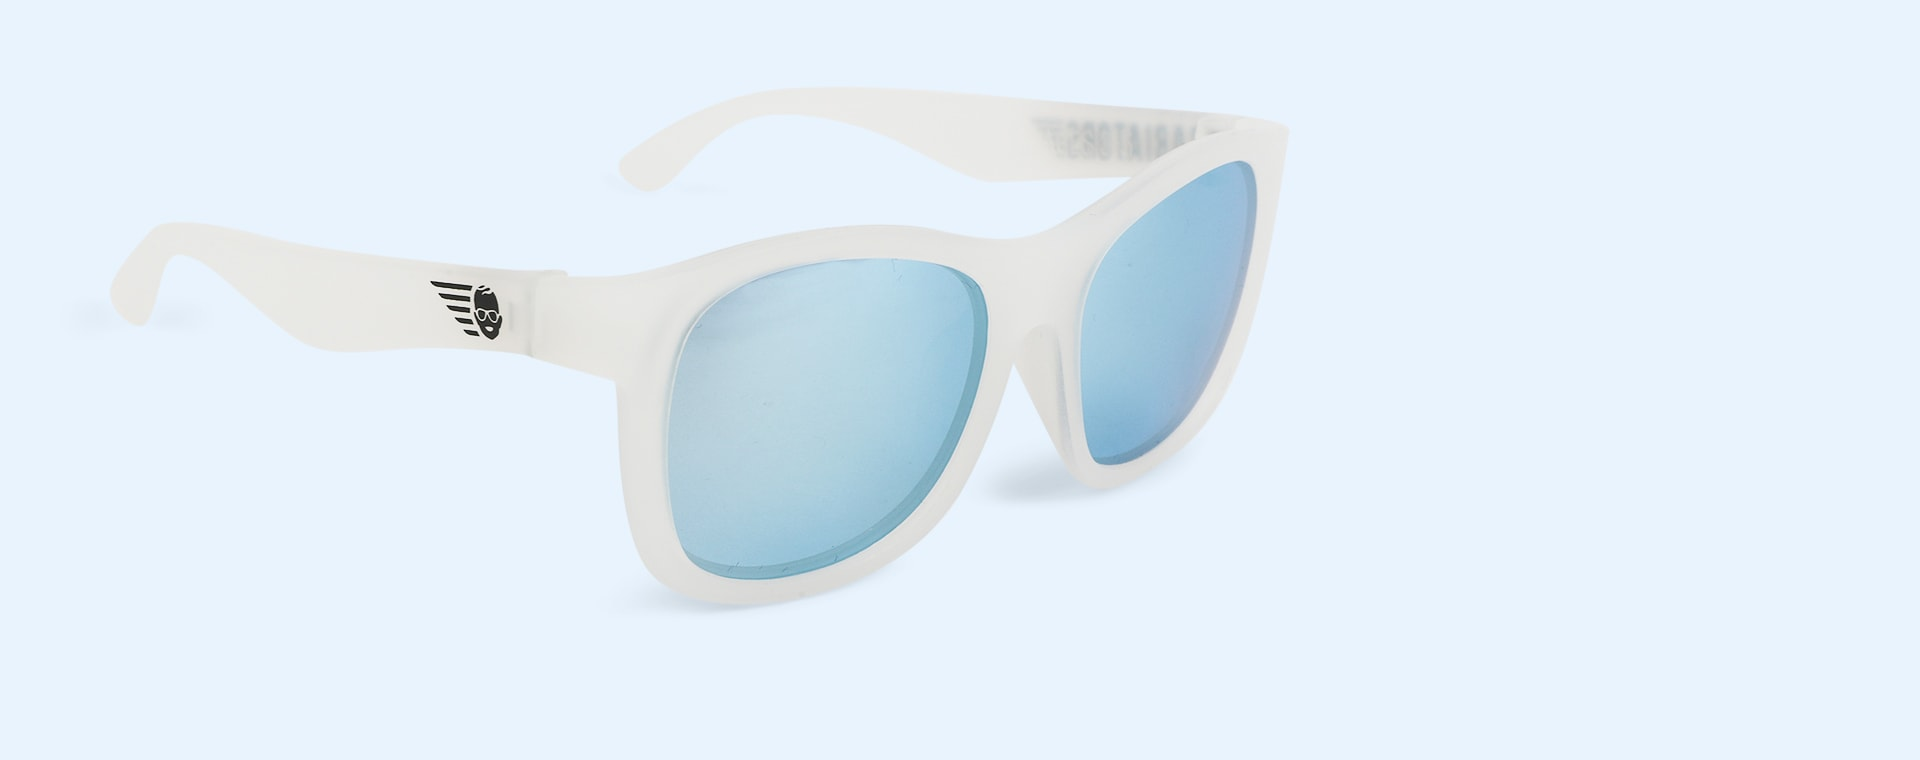 The Ice Breaker Babiators Blue Series Navigator Sunglasses